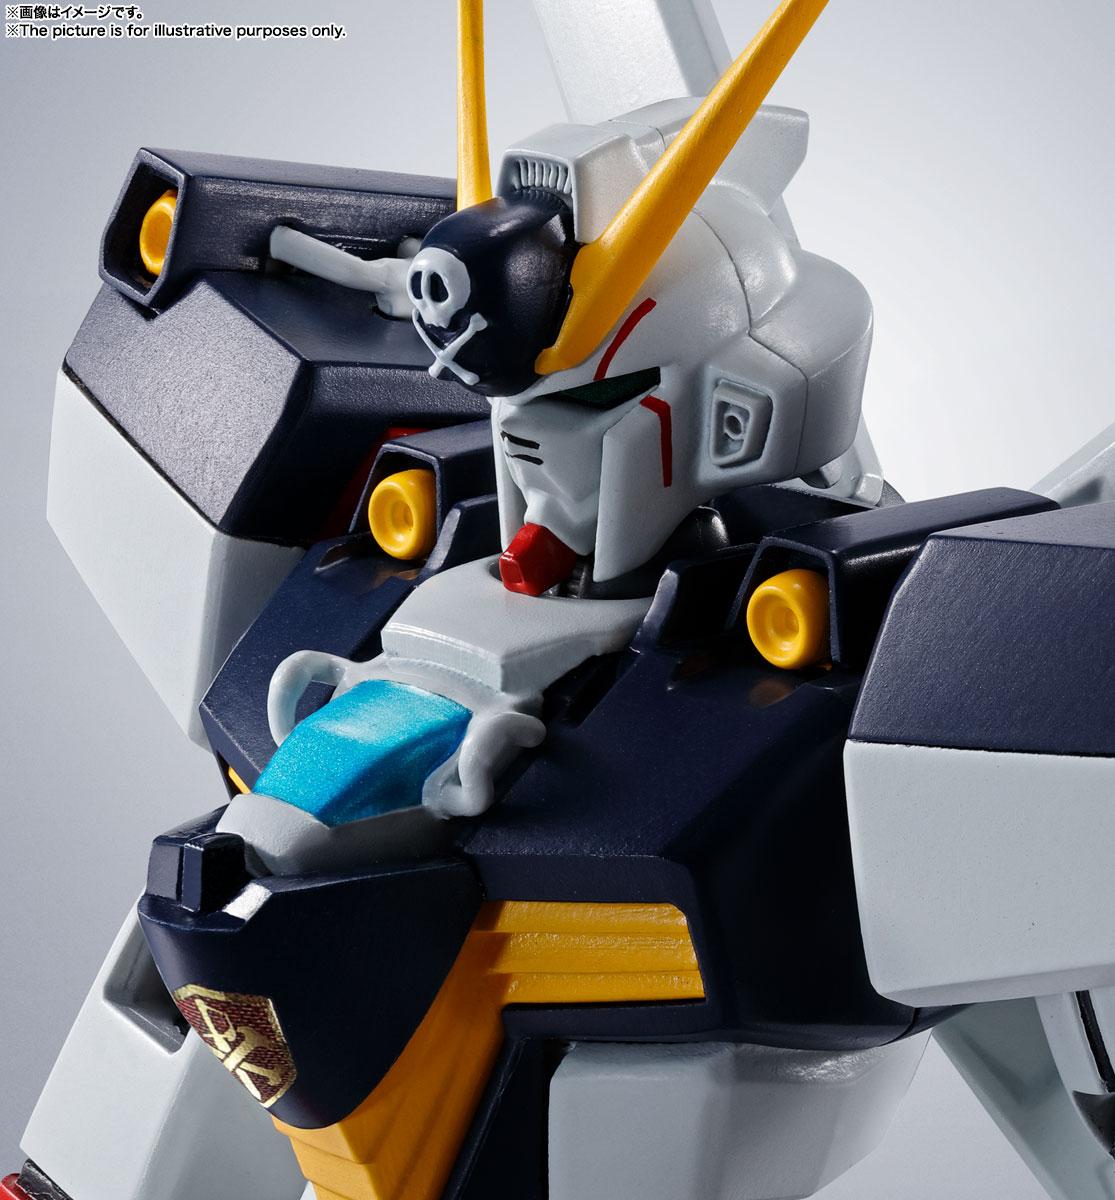 ROBOT魂〈SIDE MS〉『ガンダムX1/X1改 EVOLUTION-SPEC』クロスボーン・ガンダム 可動フィギュア-008